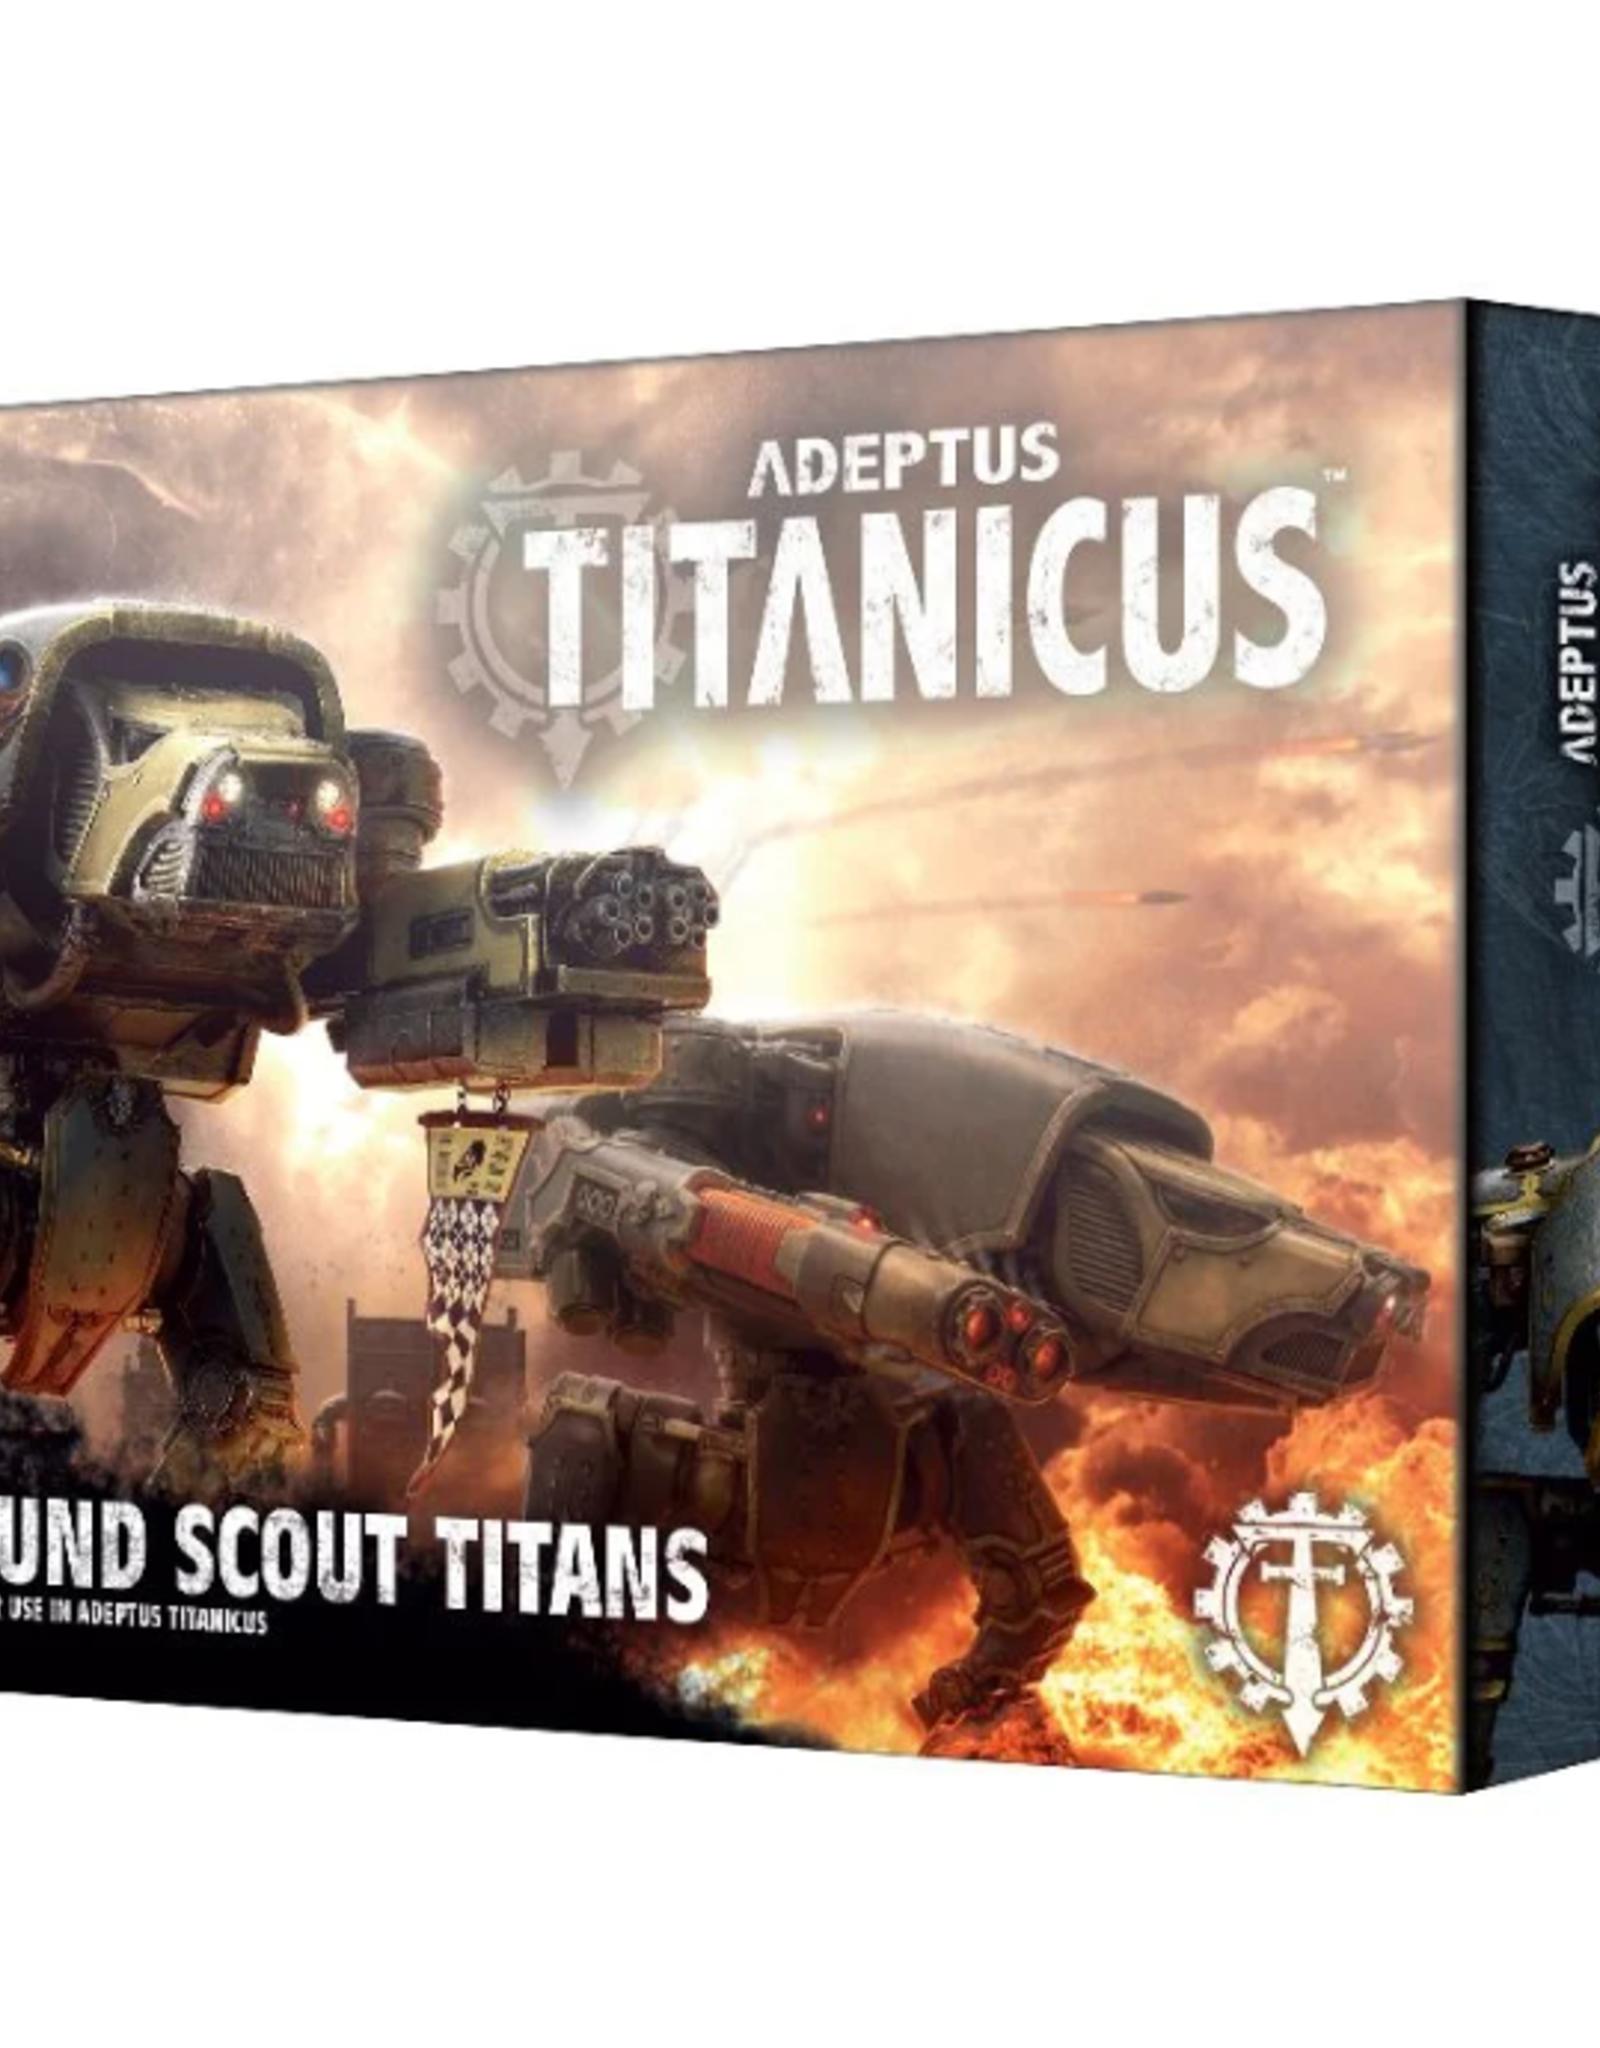 Games Workshop Adeptus Titanicus: Warhound Scout Titans